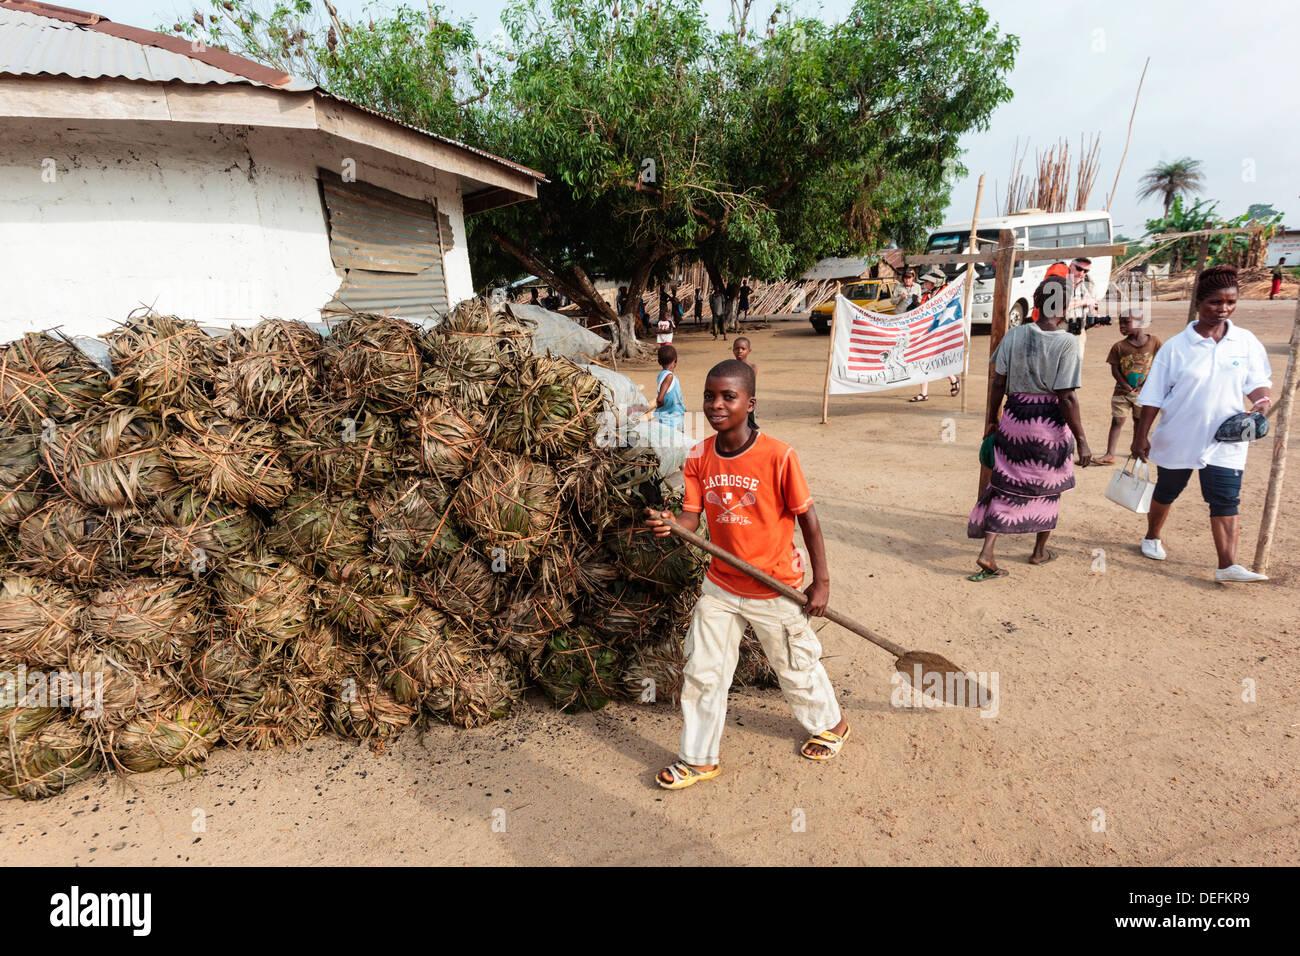 Africa, Liberia, Monrovia. People walking by bundles of dried pandanus. - Stock Image